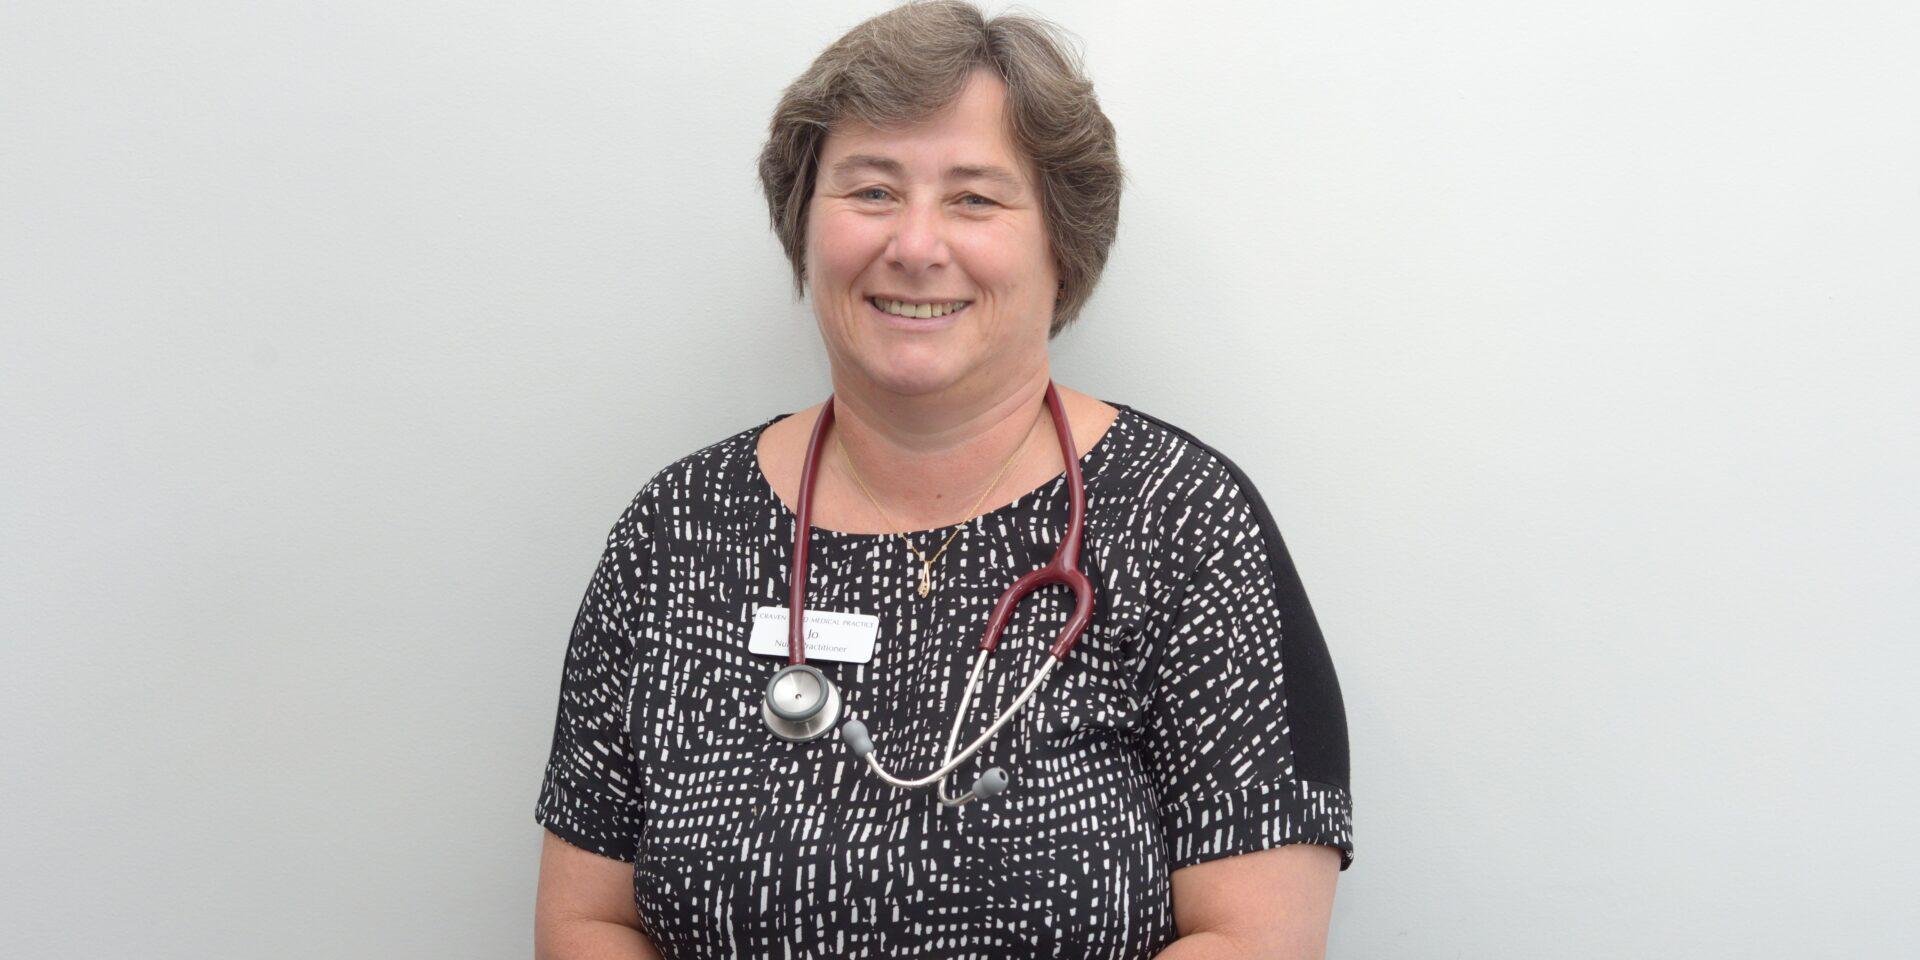 advanced nurse practitioner transforming